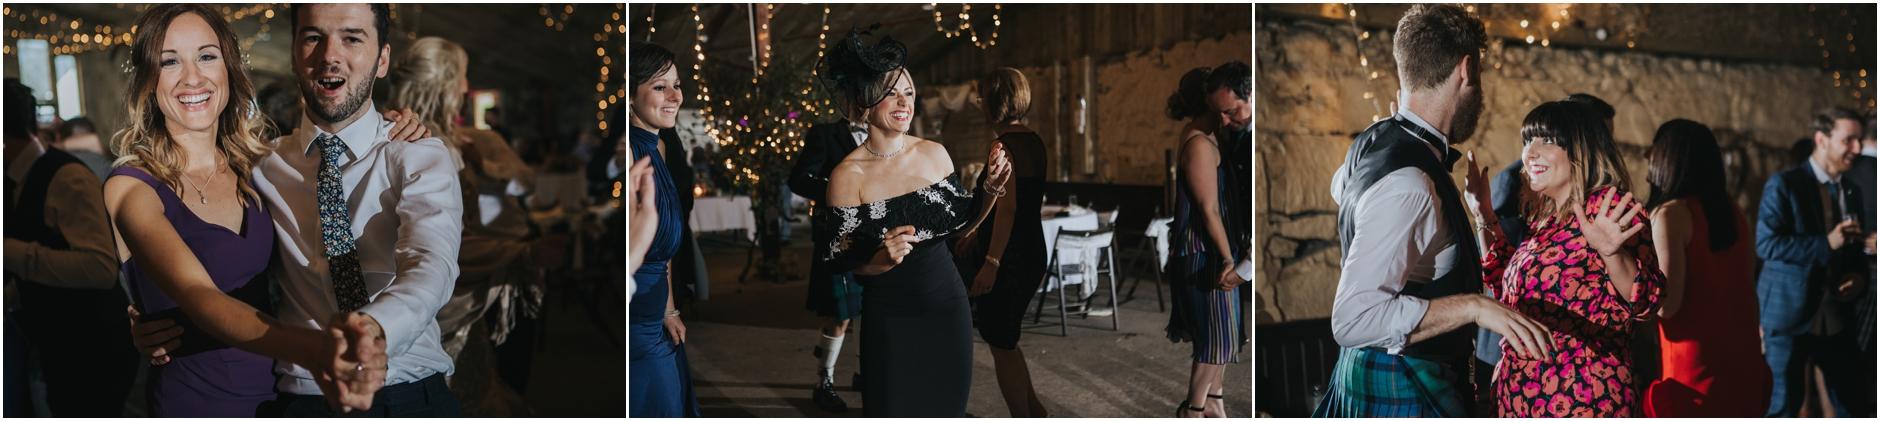 relaxed alternative wedding photography